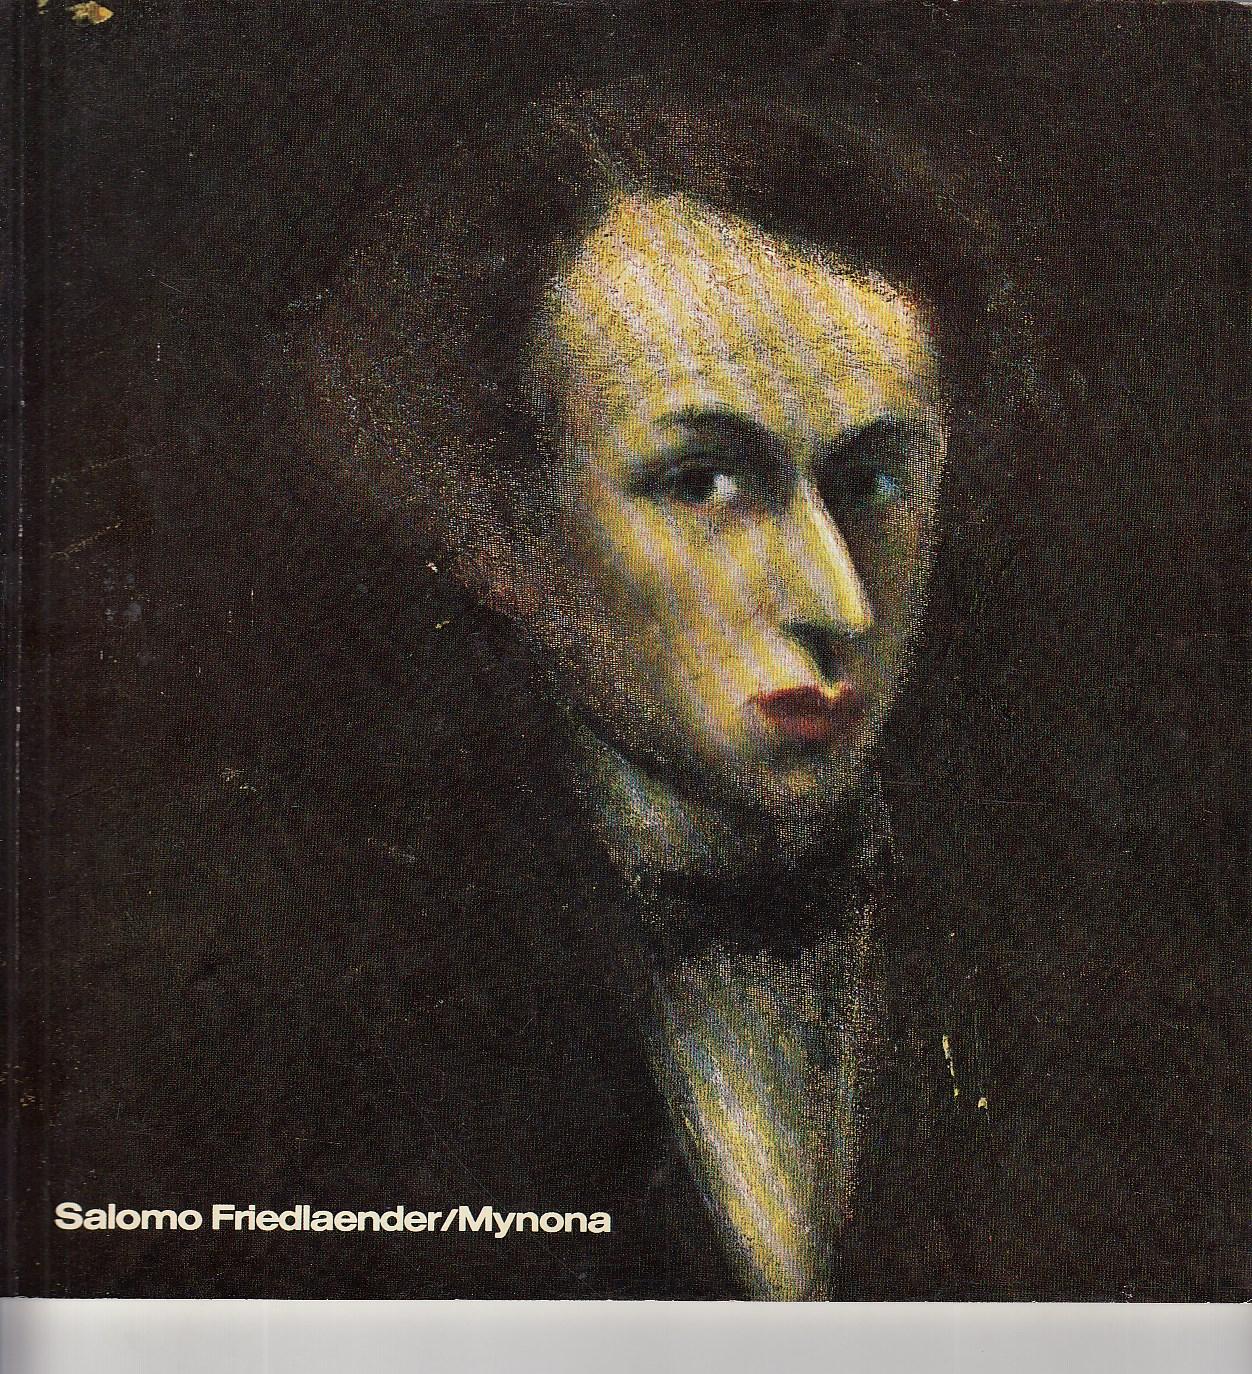 Salomo Friedlaender/Mynona. 1971-1946. Ausstellungskatalog. Redaktionalther Huder. Viele Abbildungen.